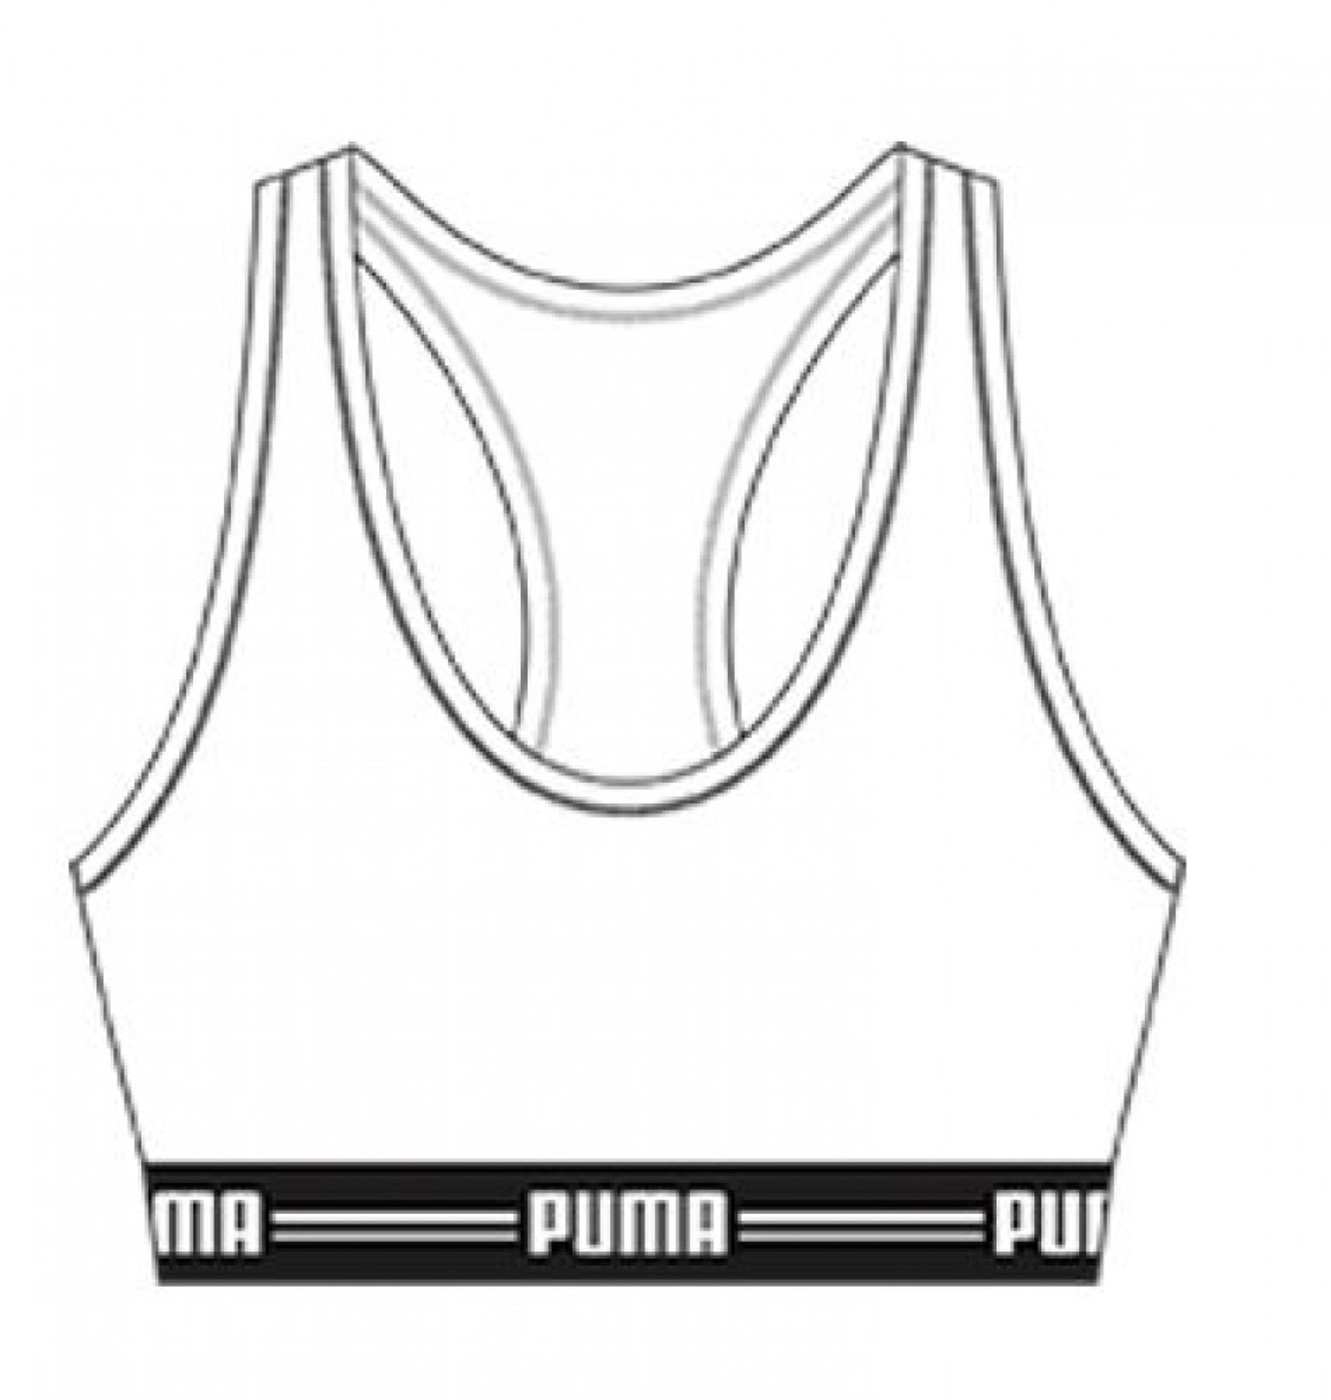 Puma Racer Back Top - Damen